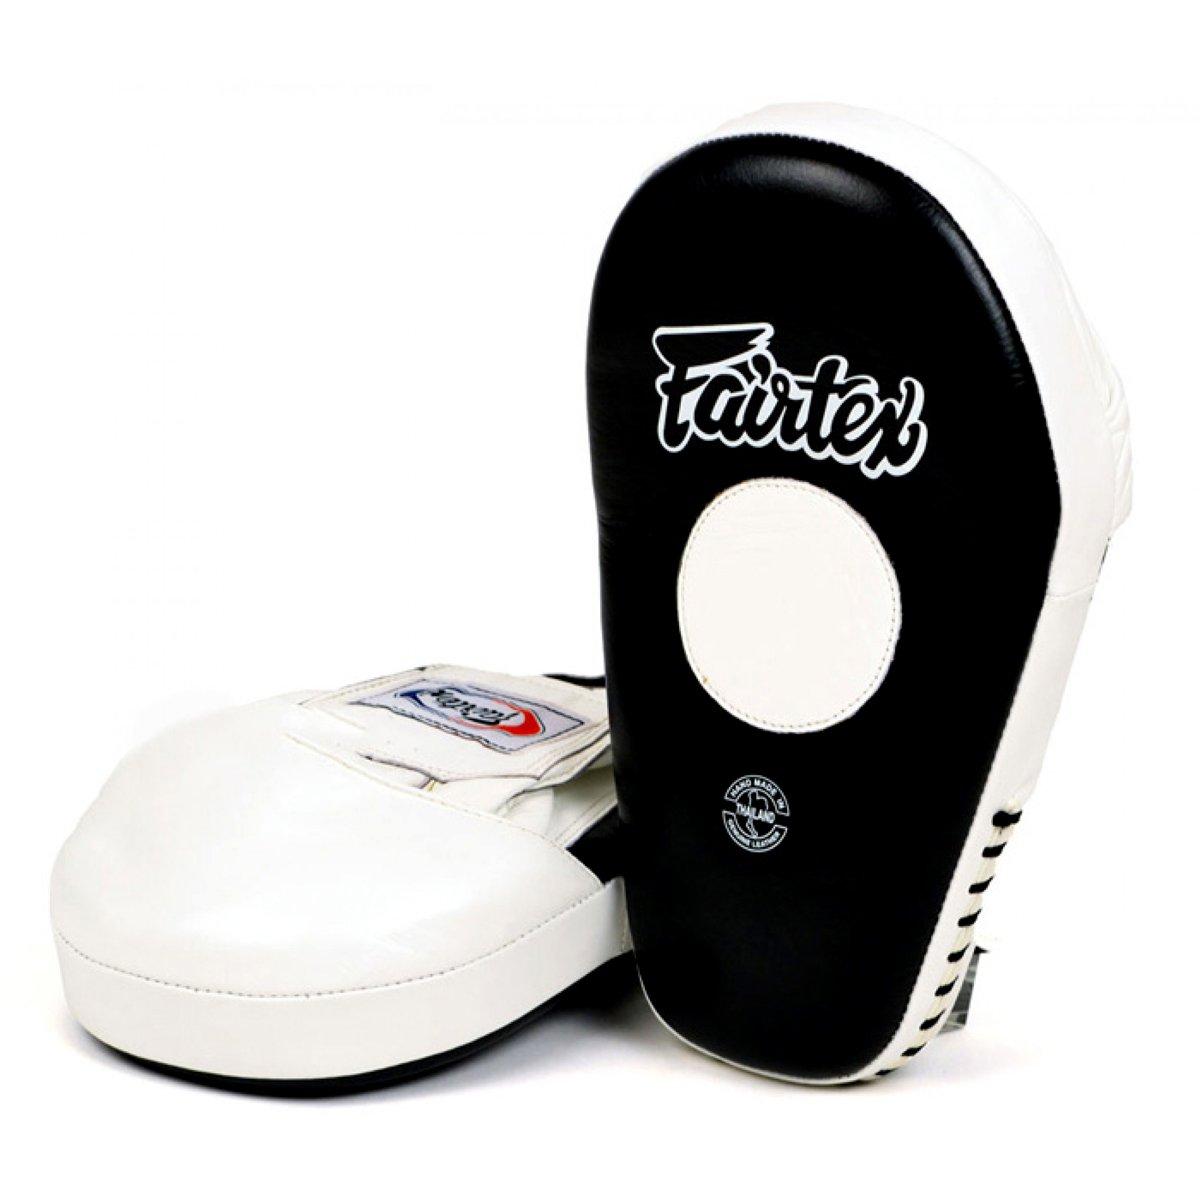 FMV8 Fairtex Pro Angular Focus Boxing Punch Mitts Muay Thai MMA Pads Equipment Thai Boxing Pads by Fairtex